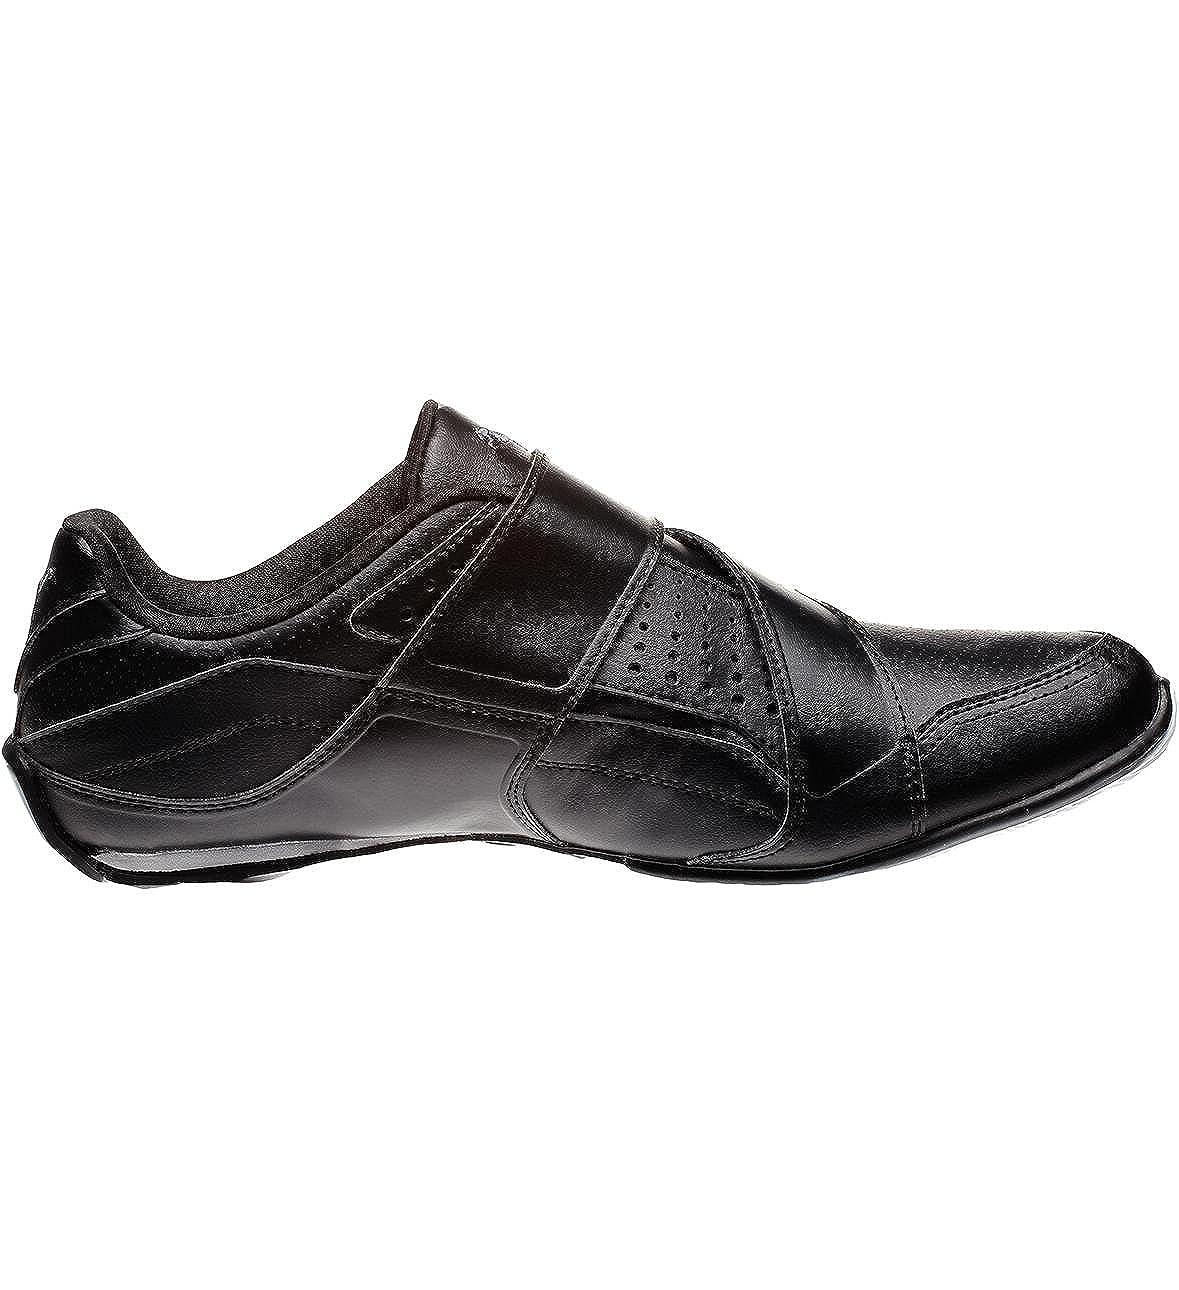 Puma Attaq Mens Velcro Black Sports Fashion Trainers (6 UK